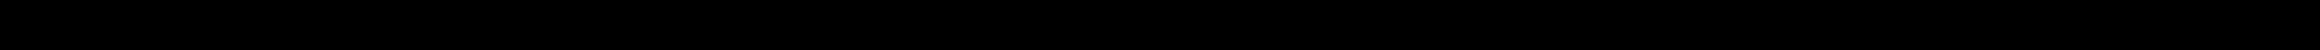 LIQUI MOLY P003654 Váltóolaj